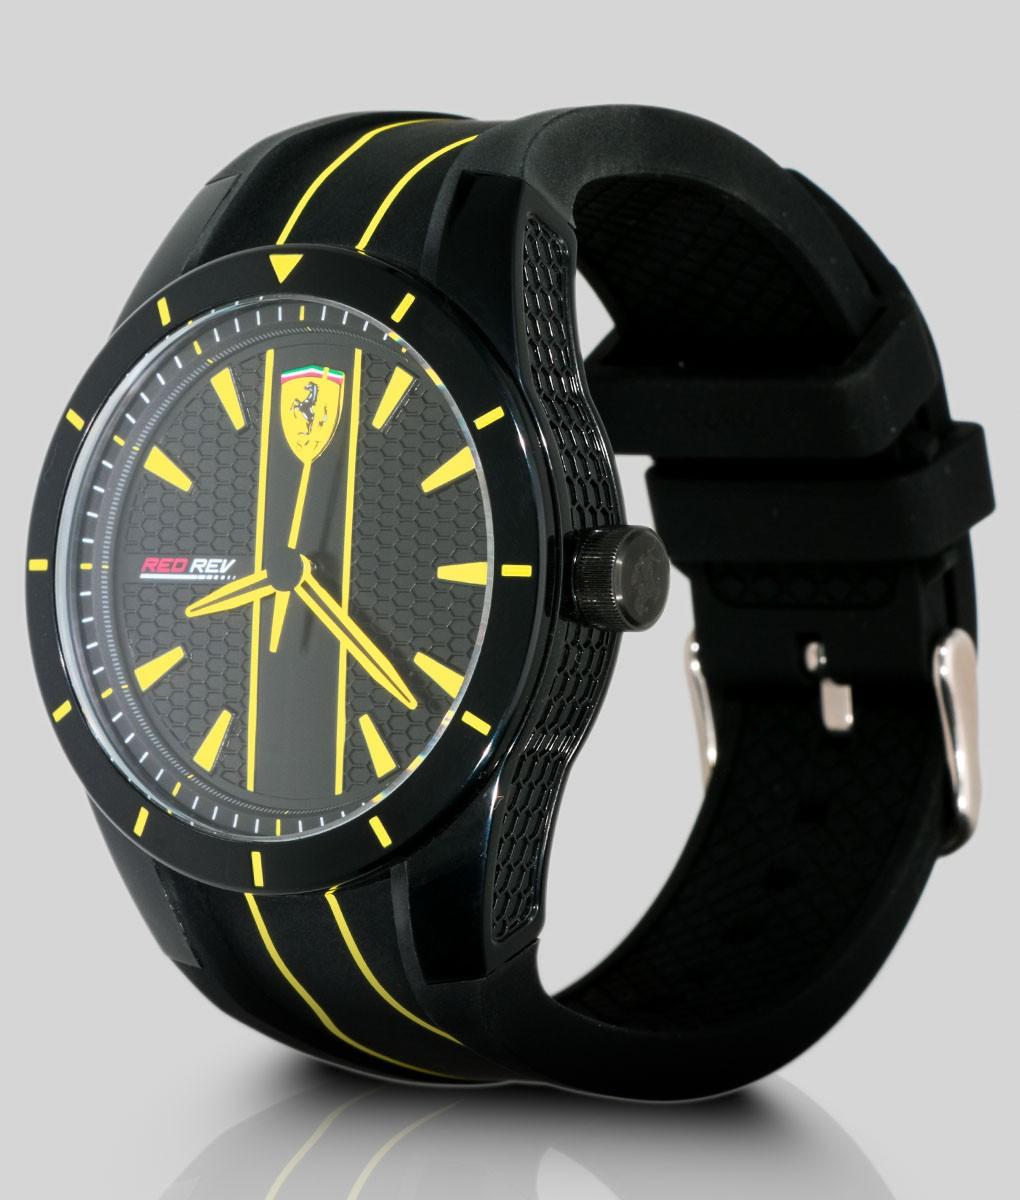 Ferrari Watch Redrev Quartz Black Yellow Formulasports